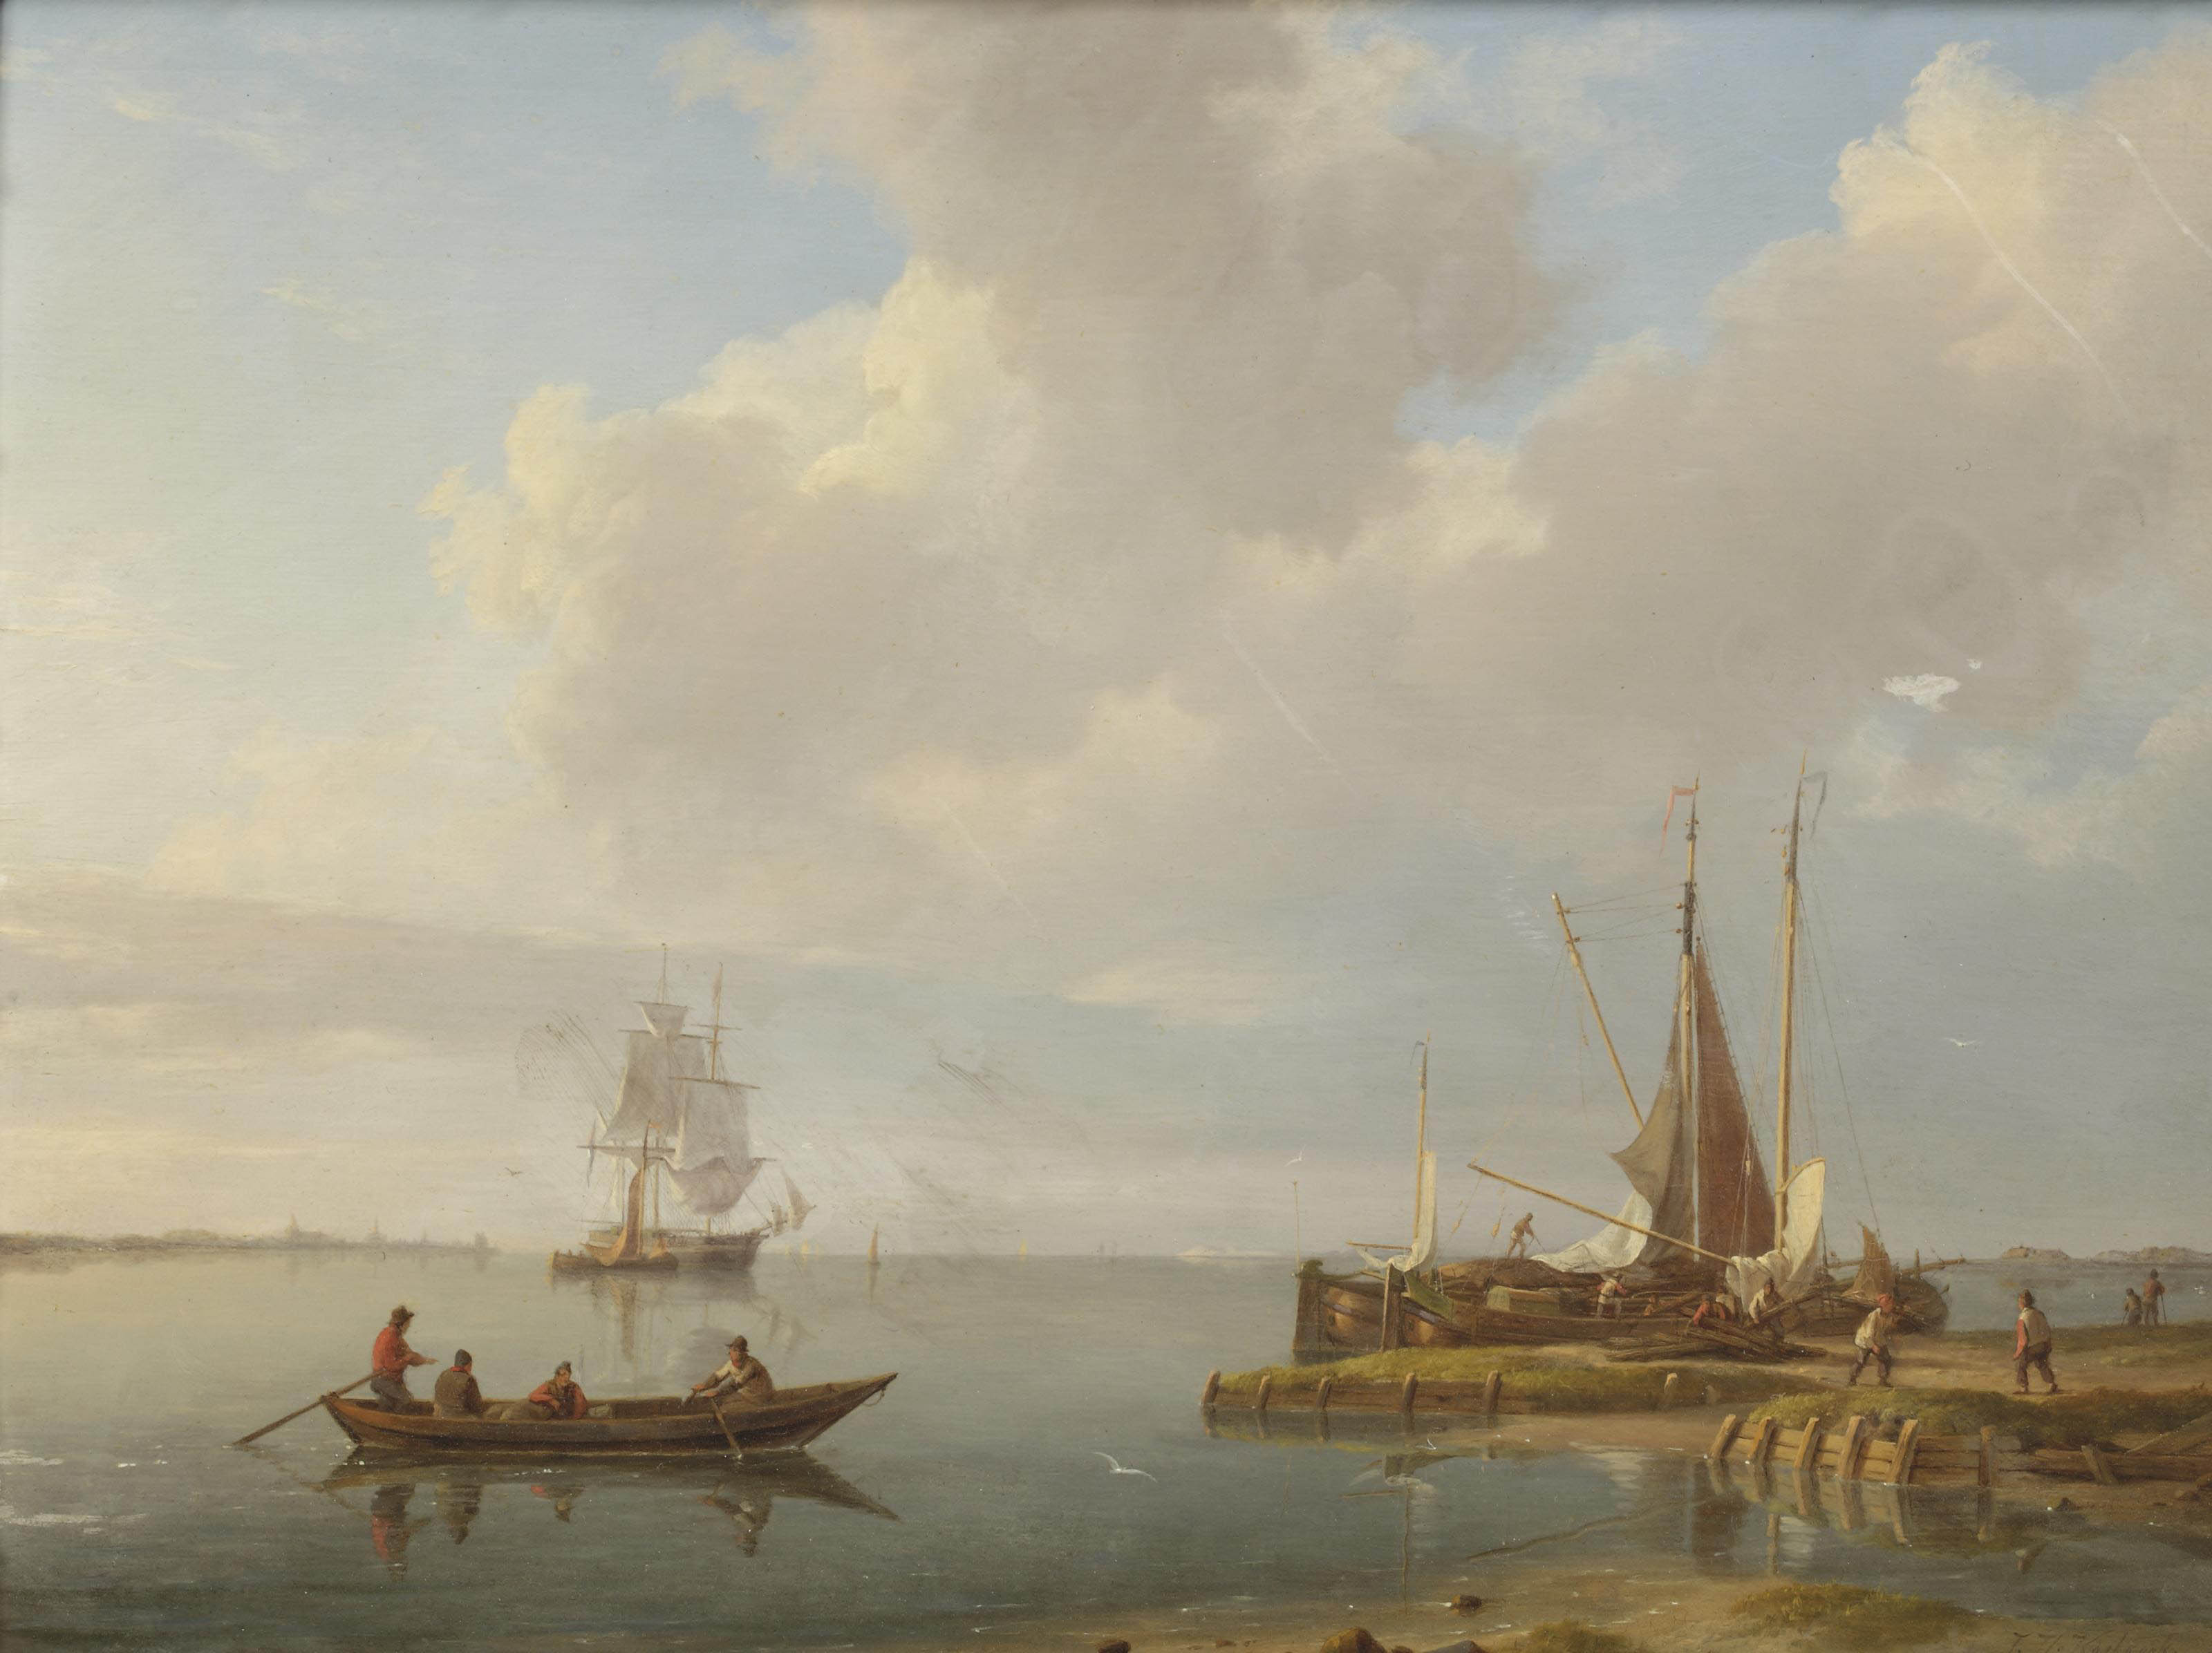 Fishermen and fishing boats on a calm estuary